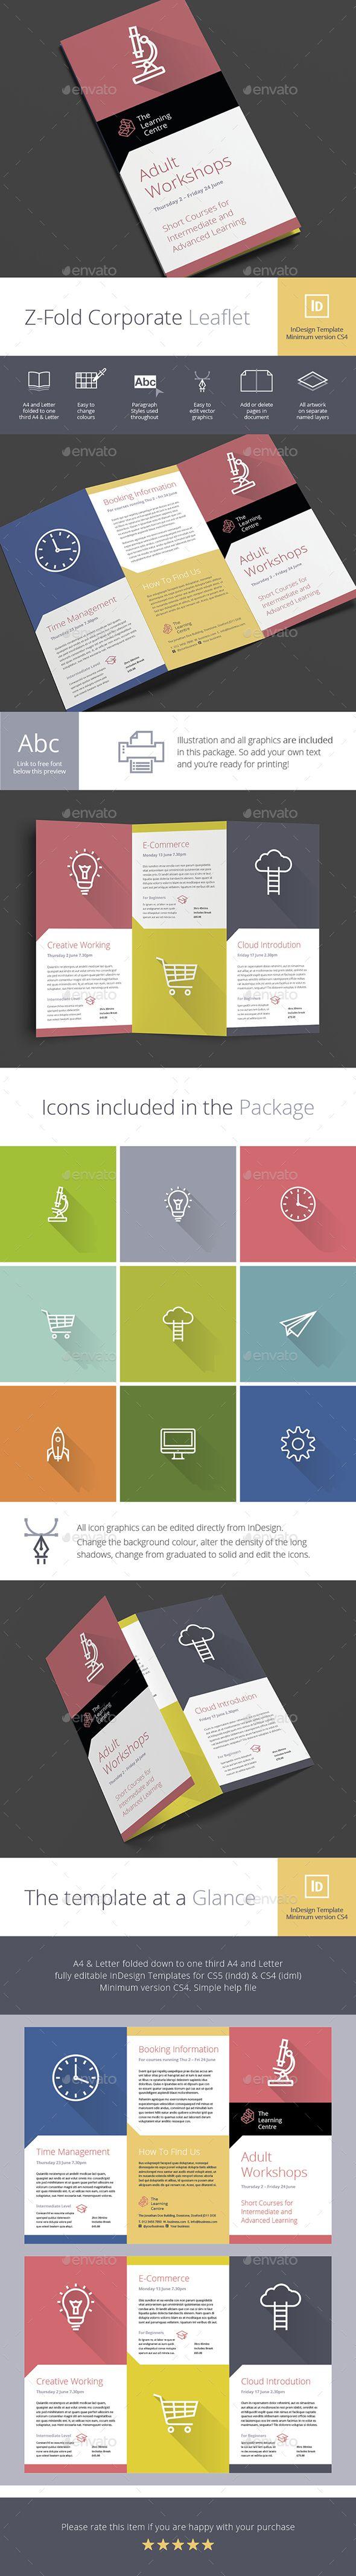 A Z-Fold / Concertina Brochure produced in InDesign (minimum